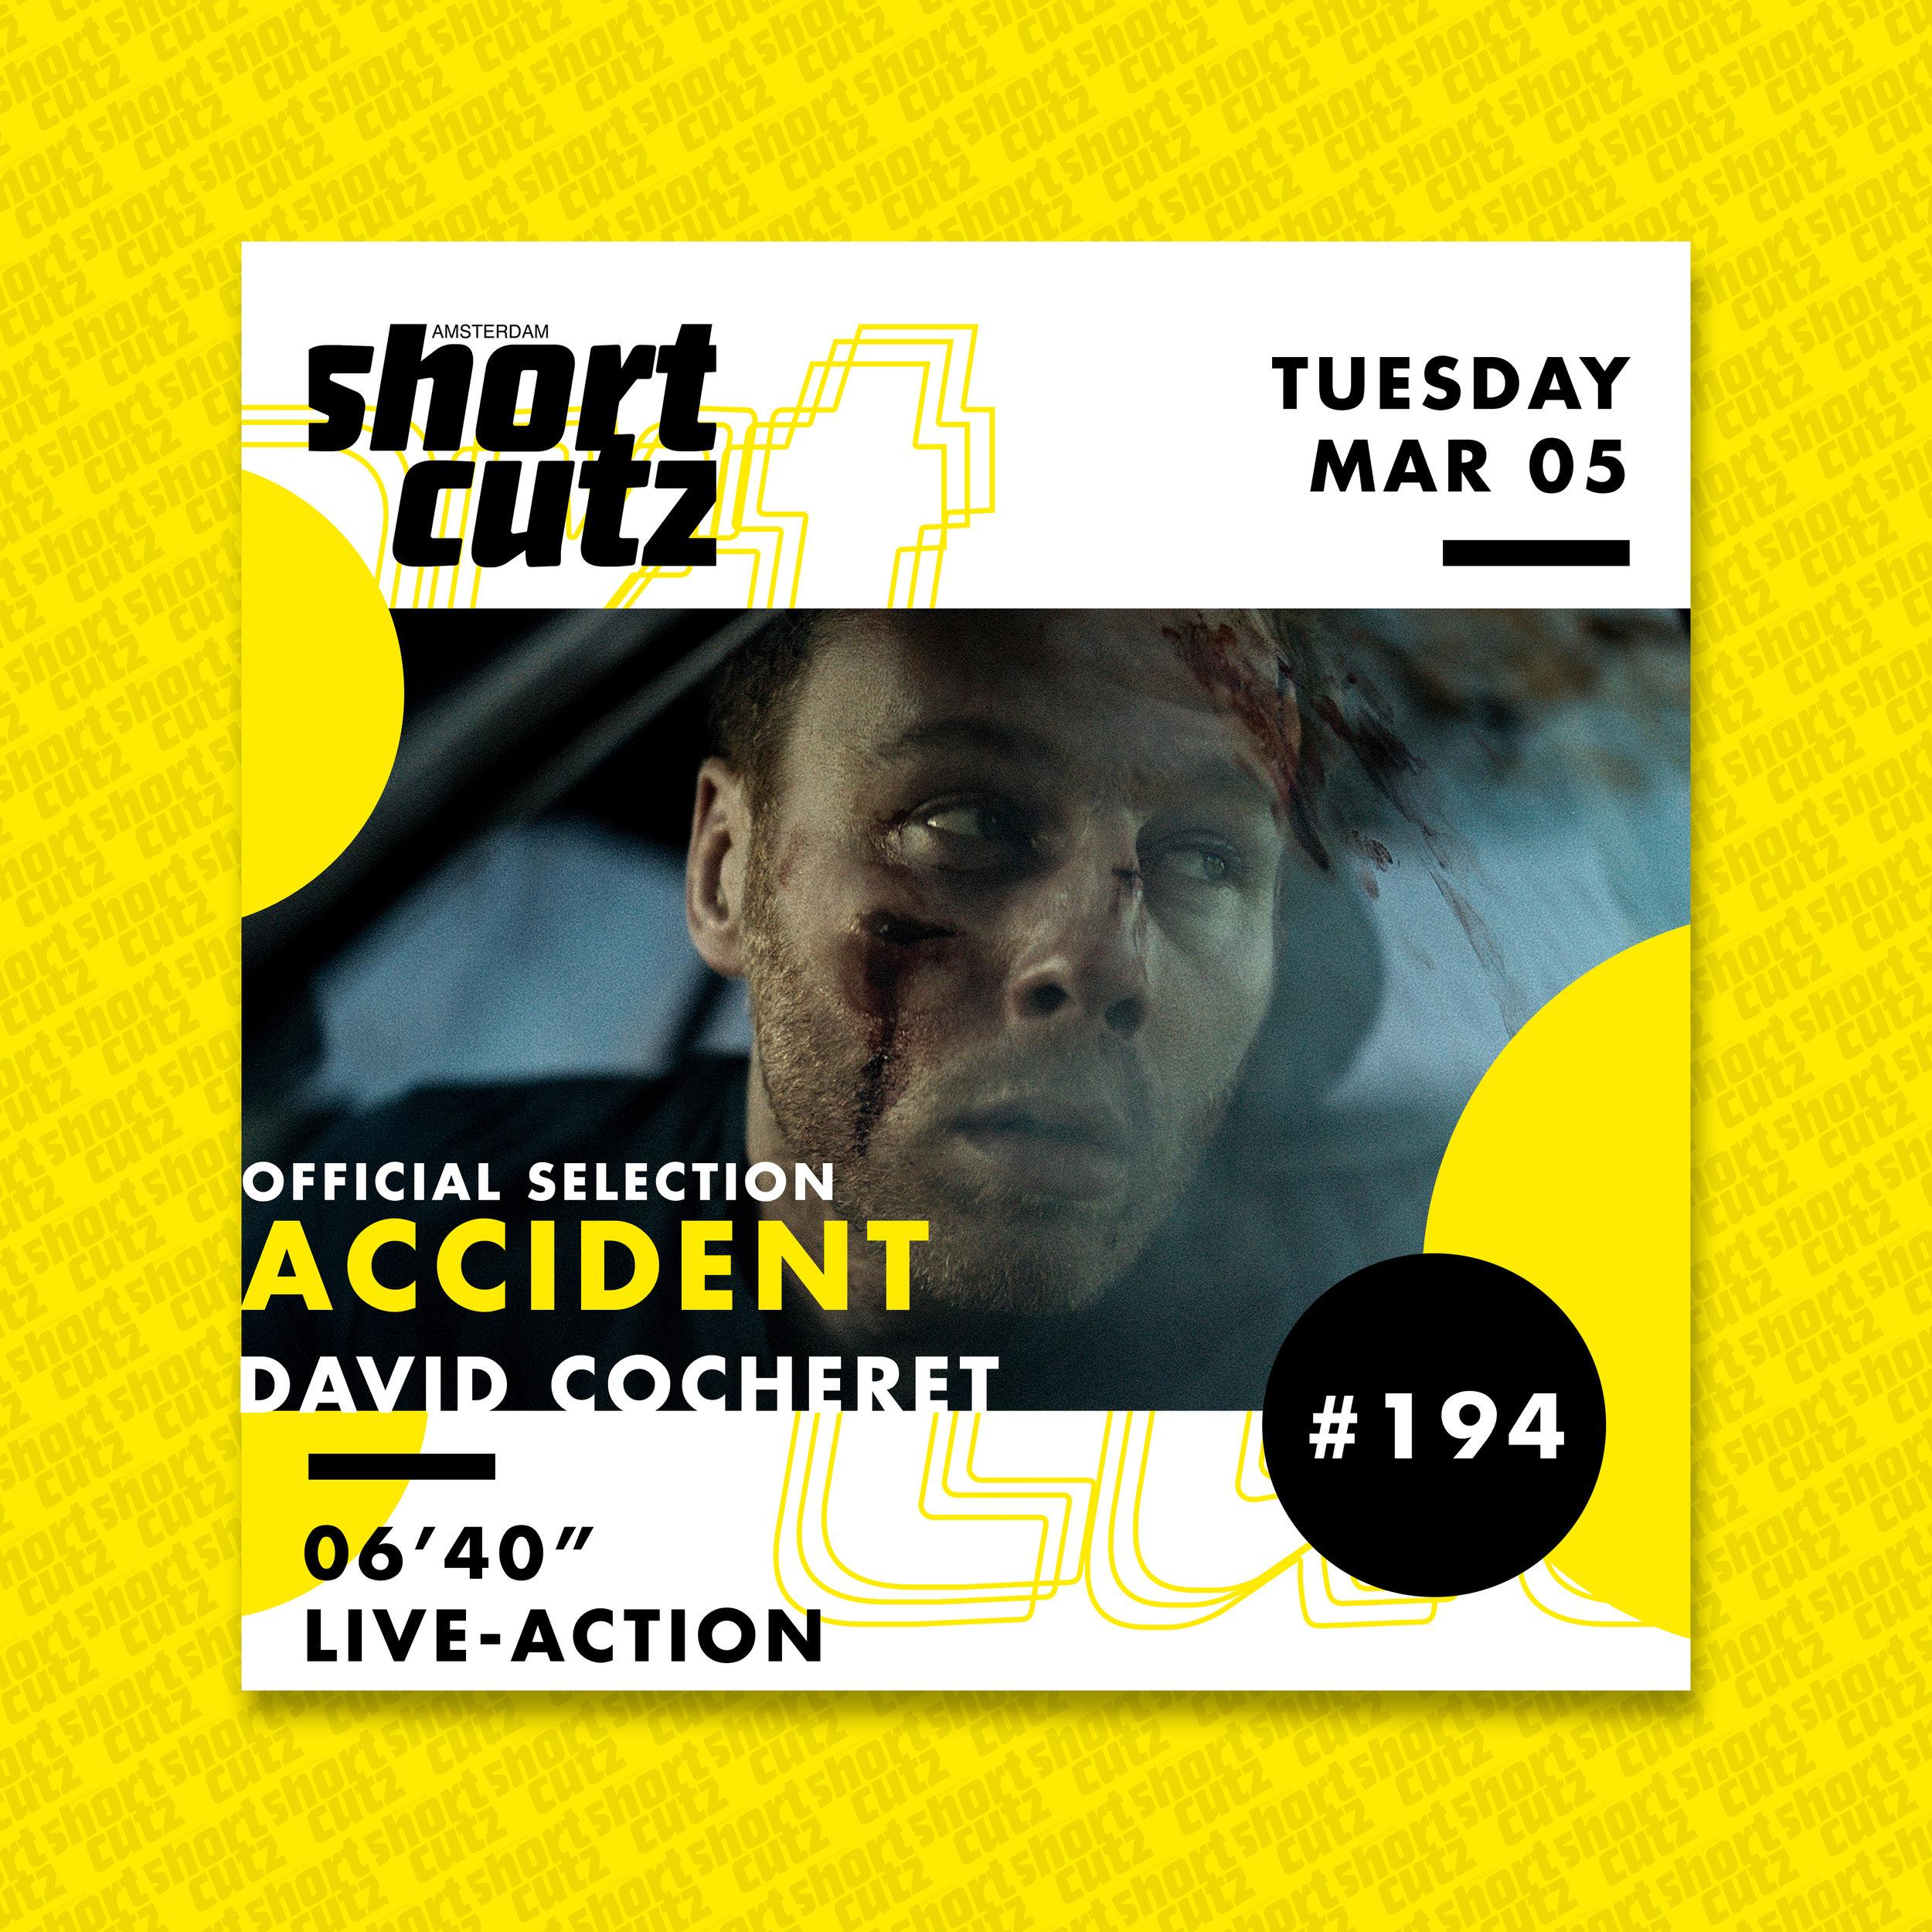 #194 Poster Accident.jpg